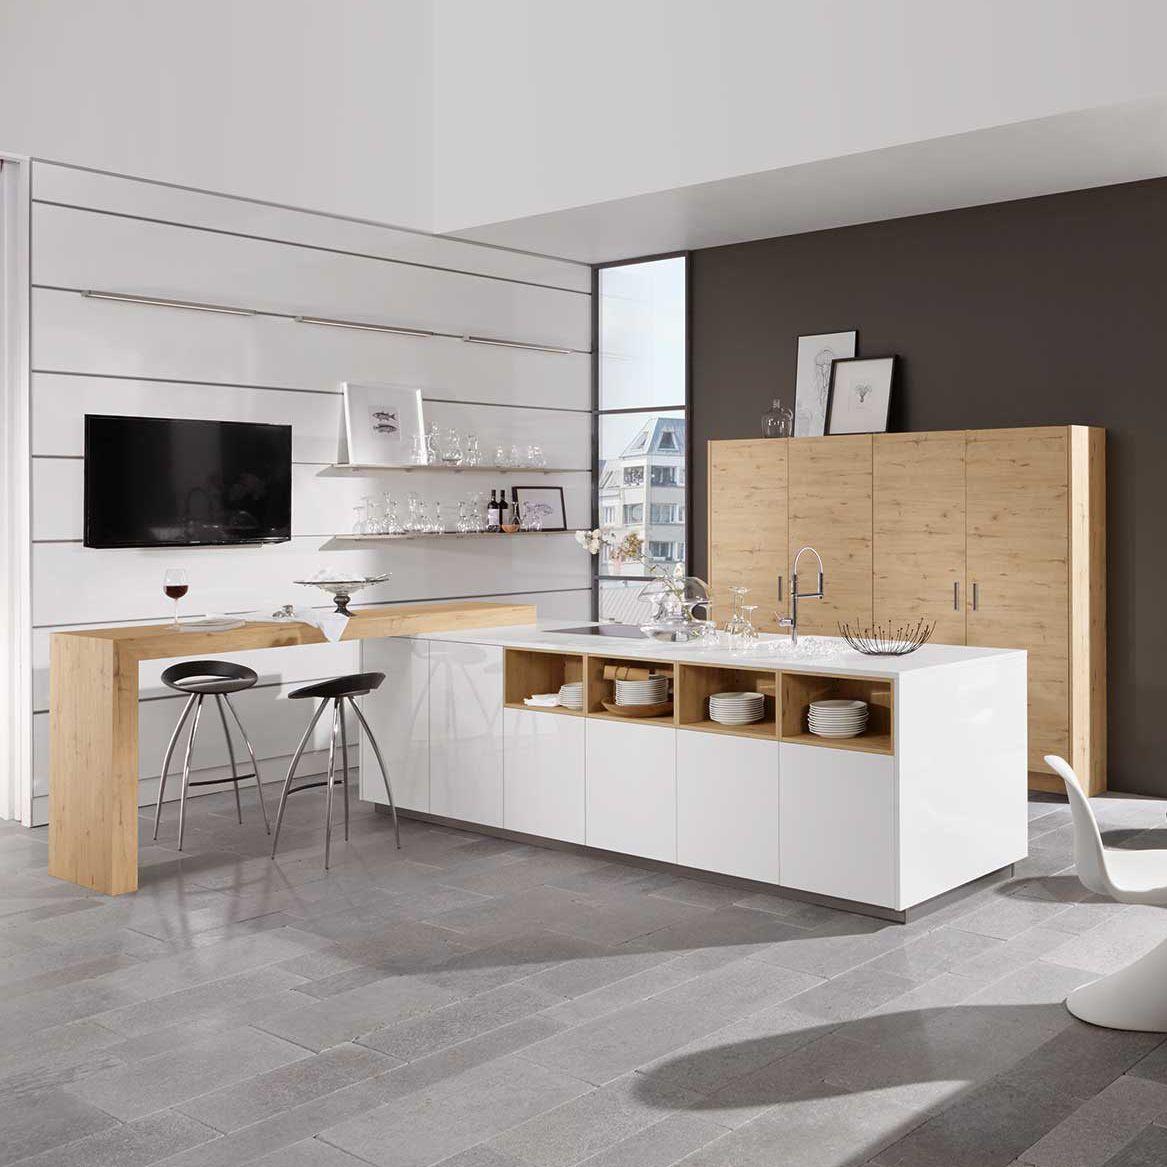 Moderne Küche / aus Eiche / Laminat / Kochinsel - ARTWOOD RUSTIC/LUX ...